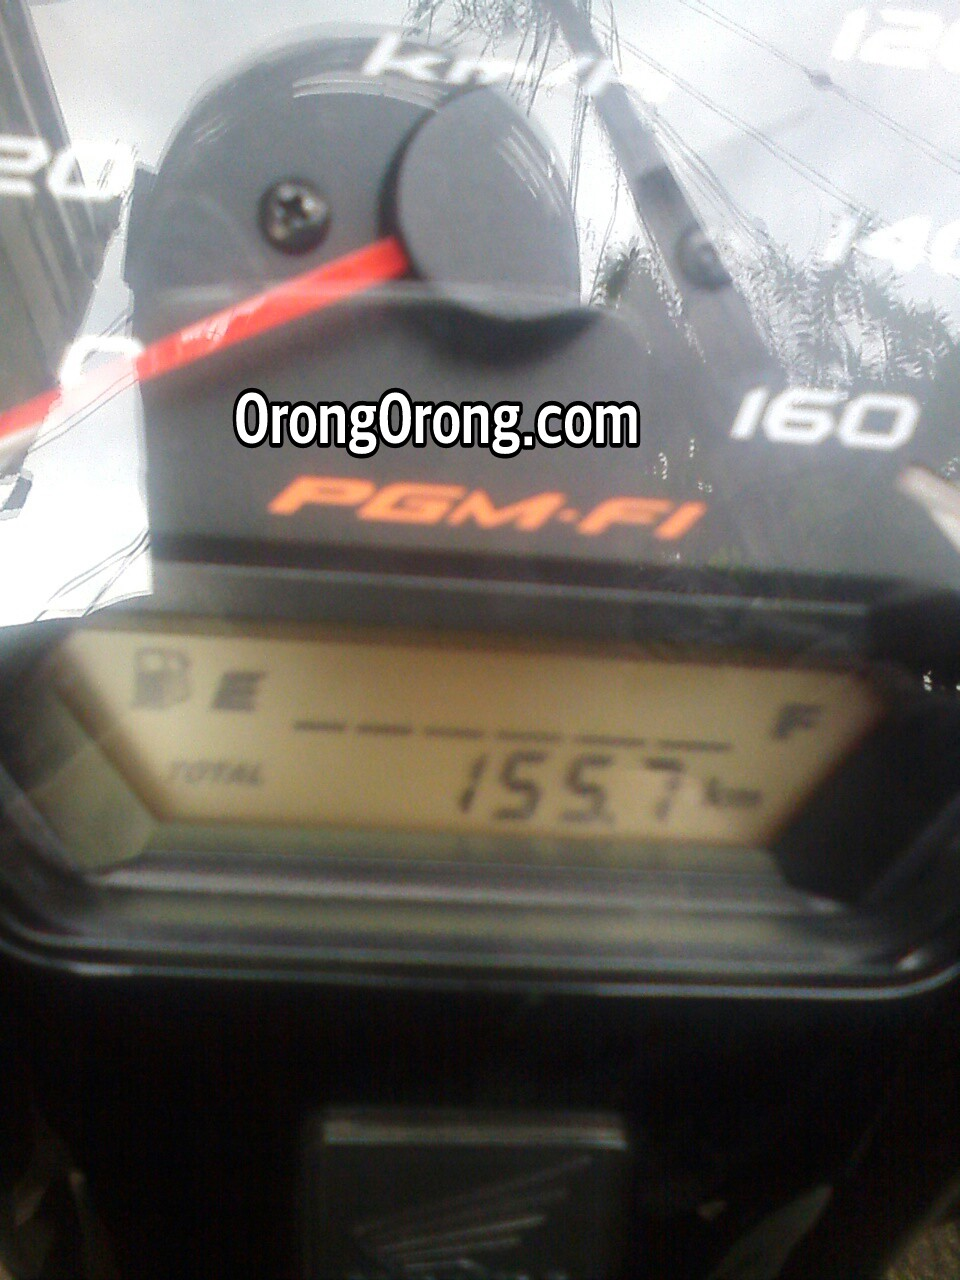 Berapa Konsumsi BBM Honda Vario 125 OrongOrongCom